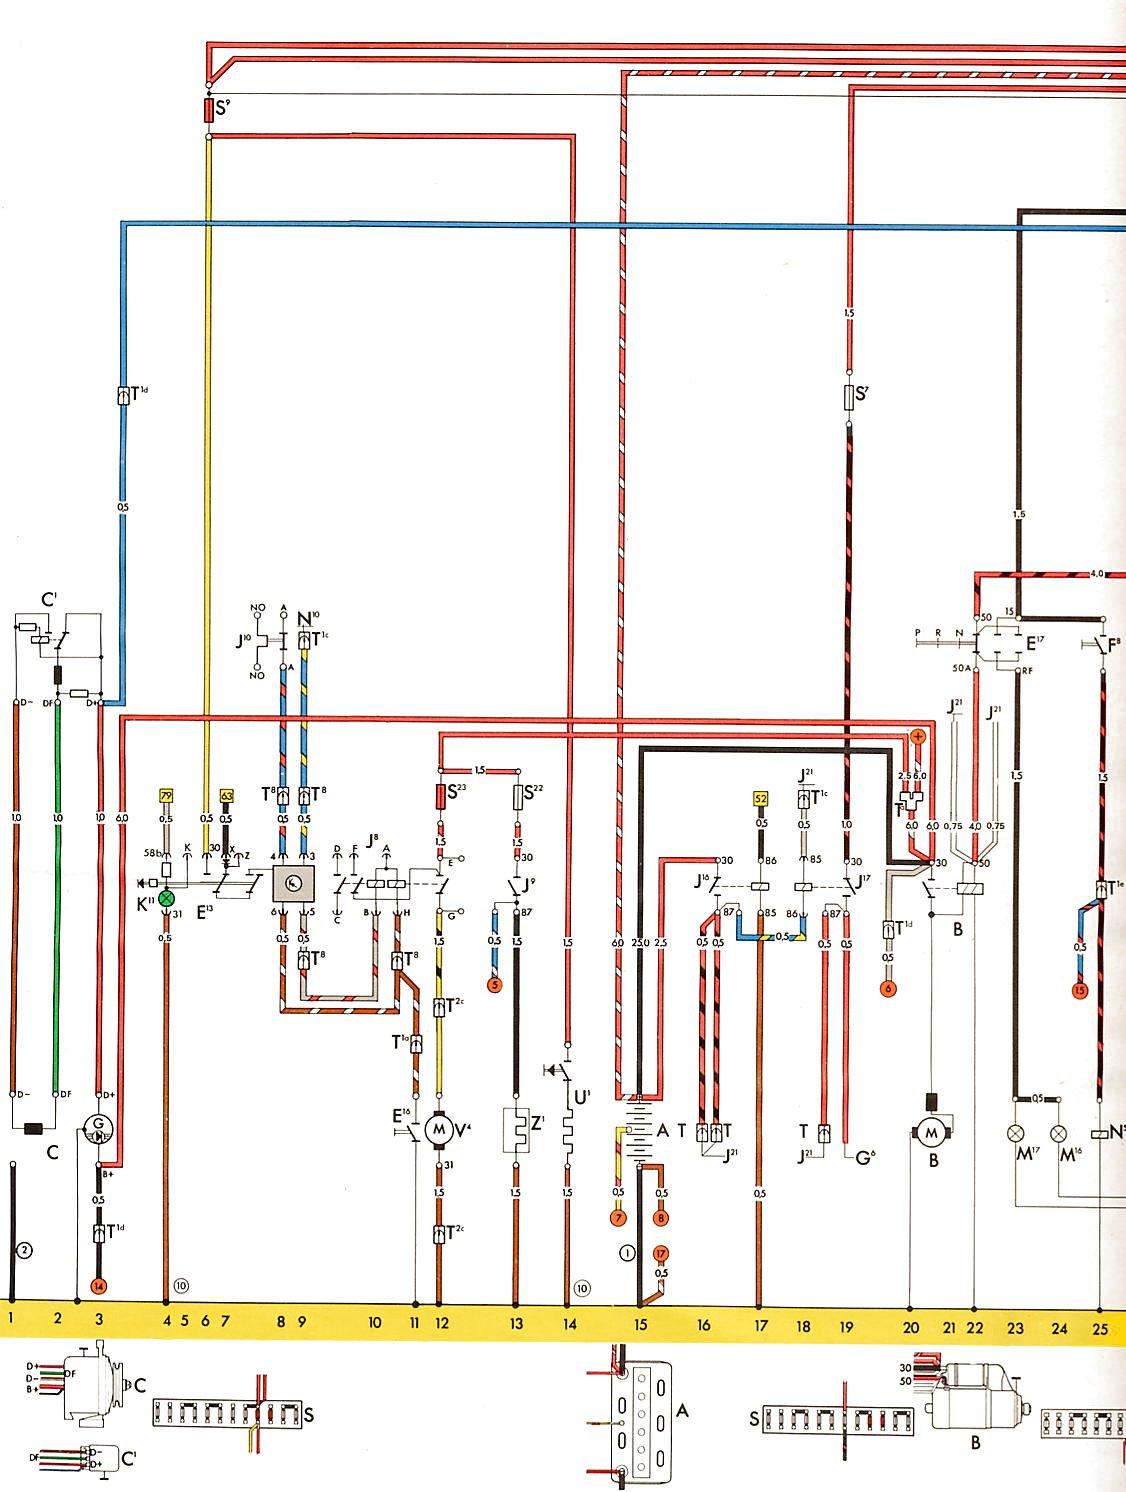 1973 vw bus wiring diagram vga to hdmi converter vintagebus type 2 usa from august 1